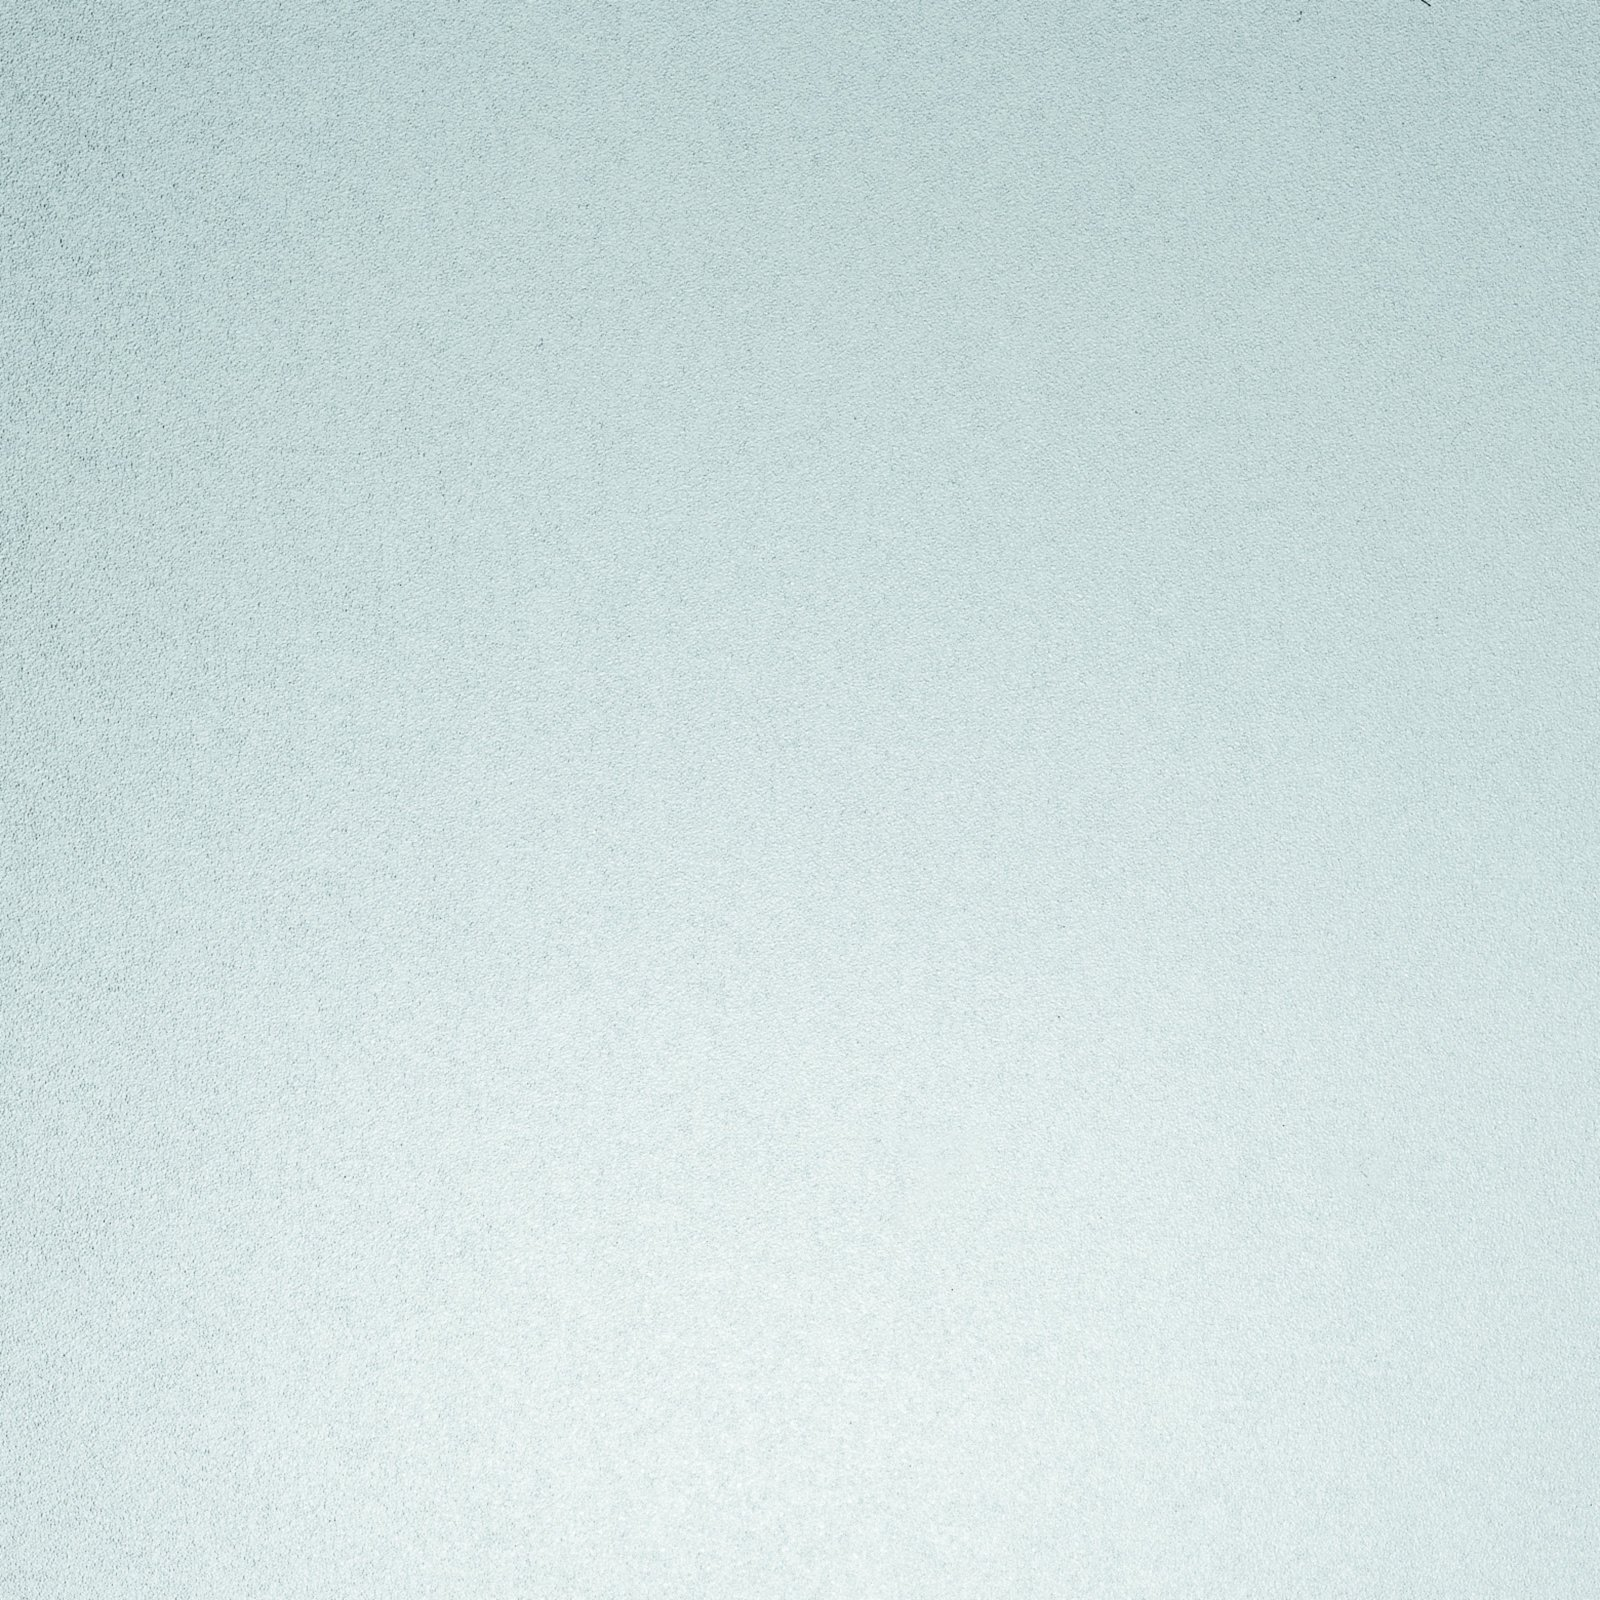 D c fix glasfolie milky milchglas 67 5x150 cm glas for Milchglas klebefolie